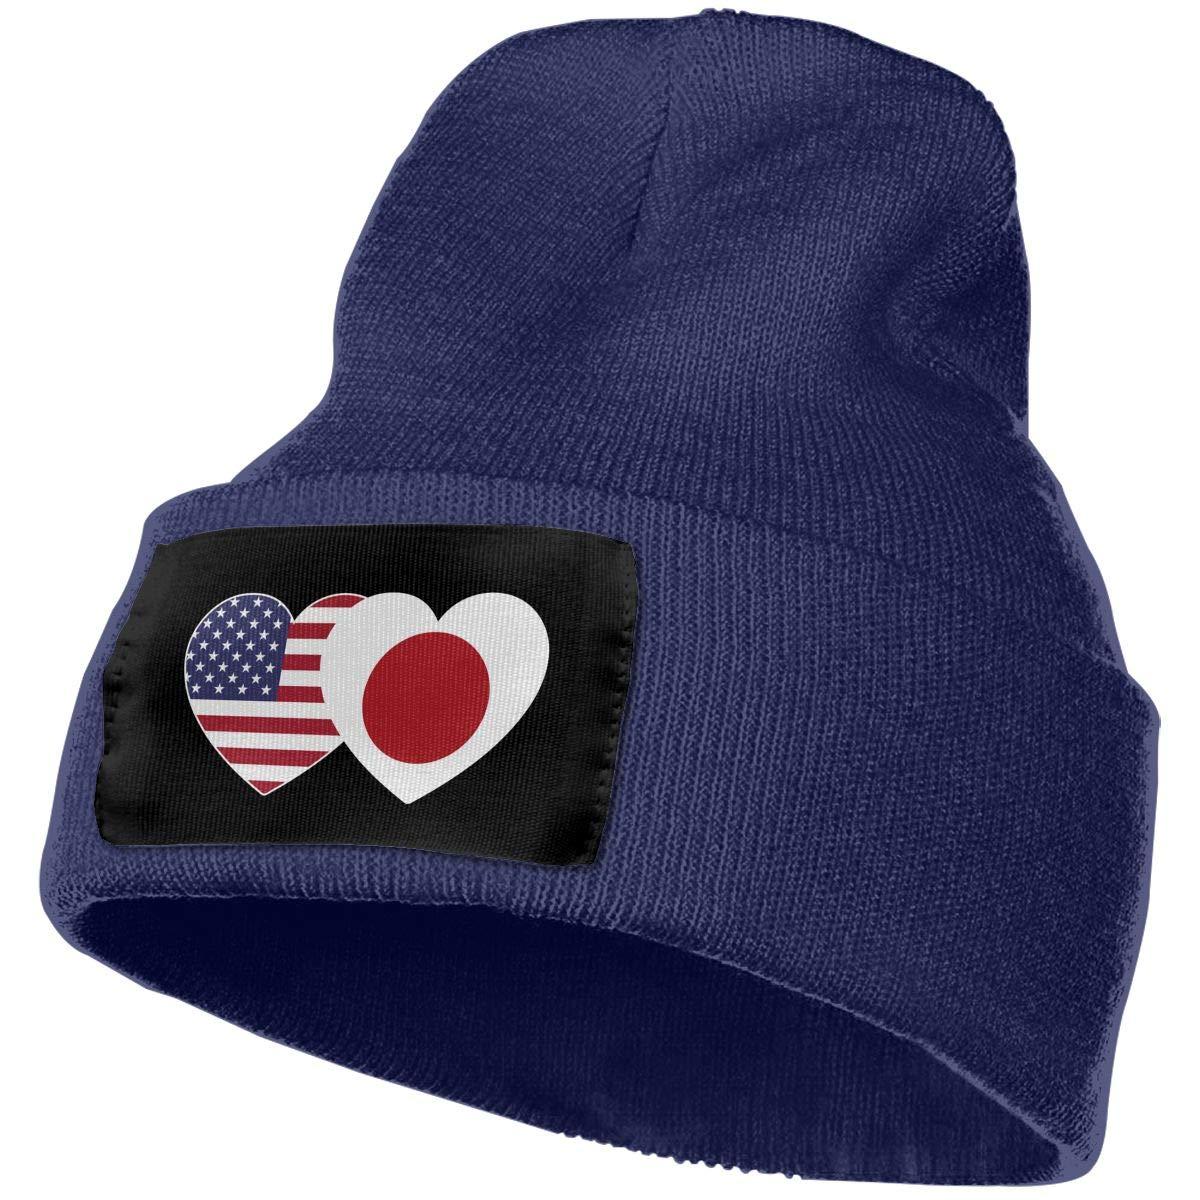 QZqDQ Japan USA Flag Twin Heart Unisex Fashion Knitted Hat Luxury Hip-Hop Cap